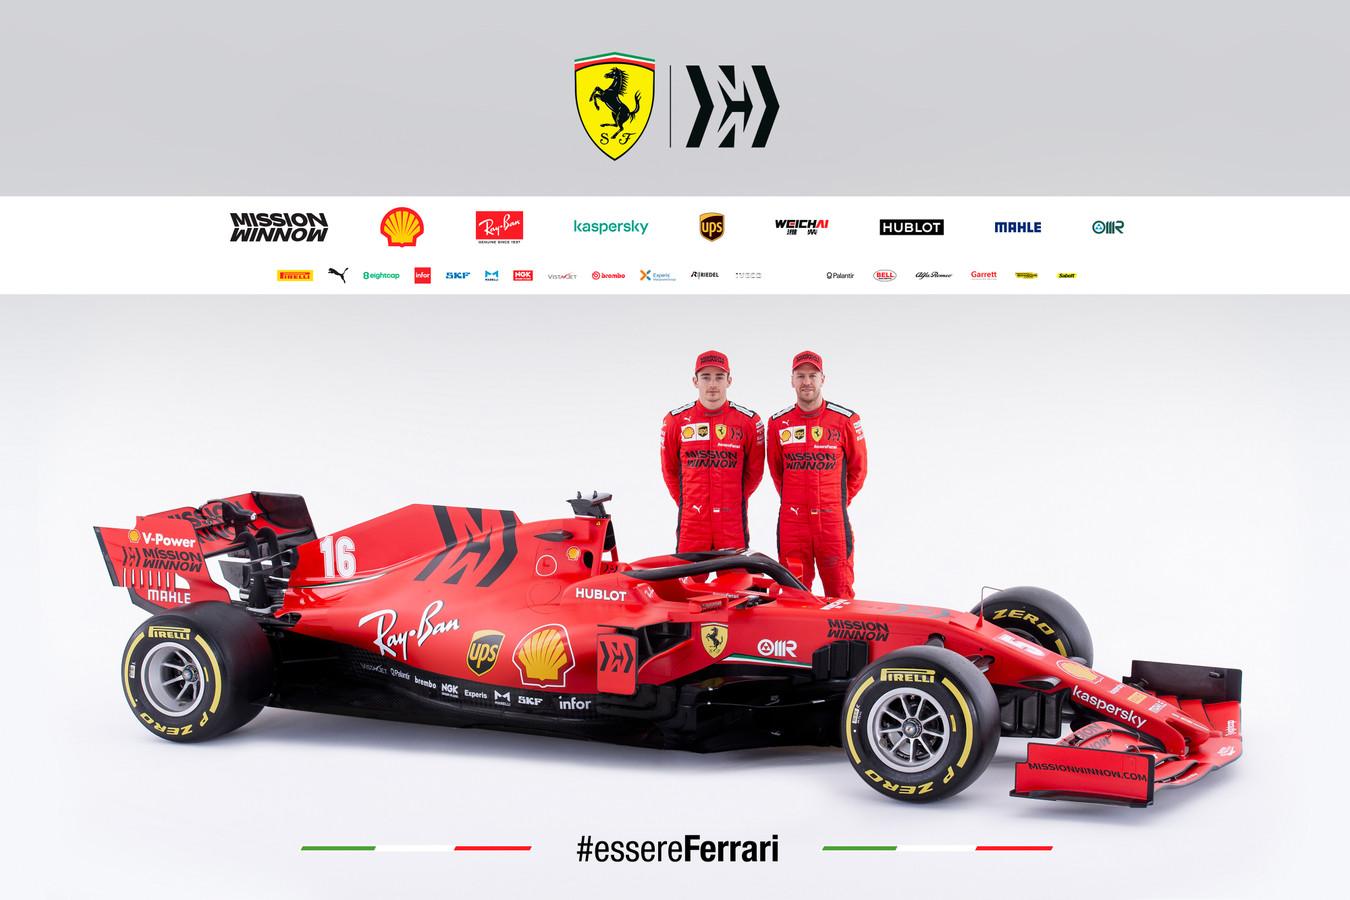 PUMA Life: Who will be the faster one at Scuderia Ferrari in 2020?